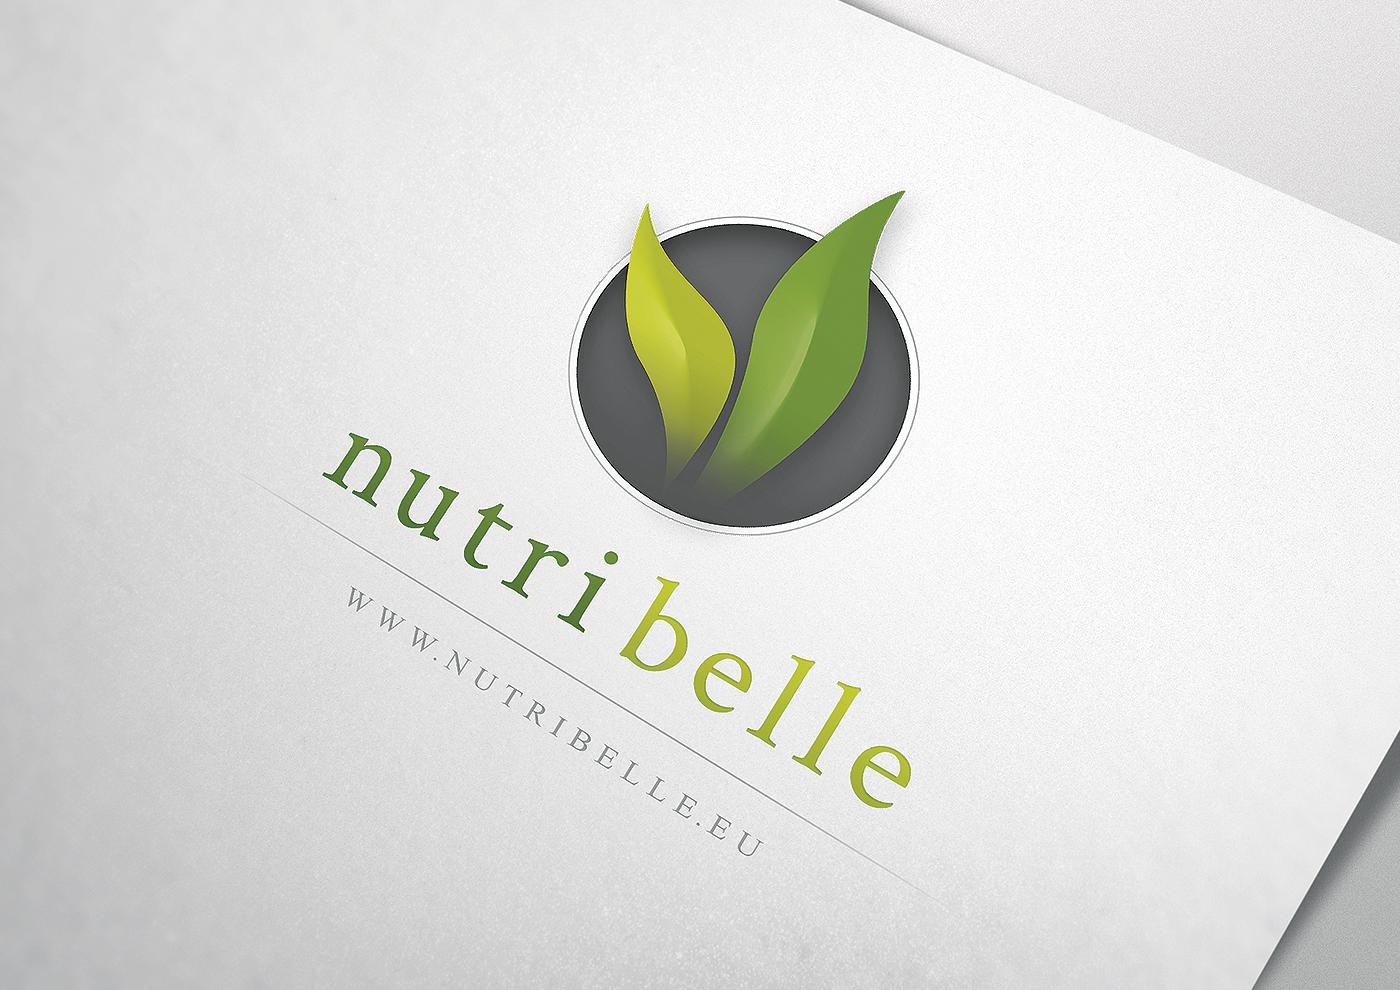 nutribelle logo Icon brand